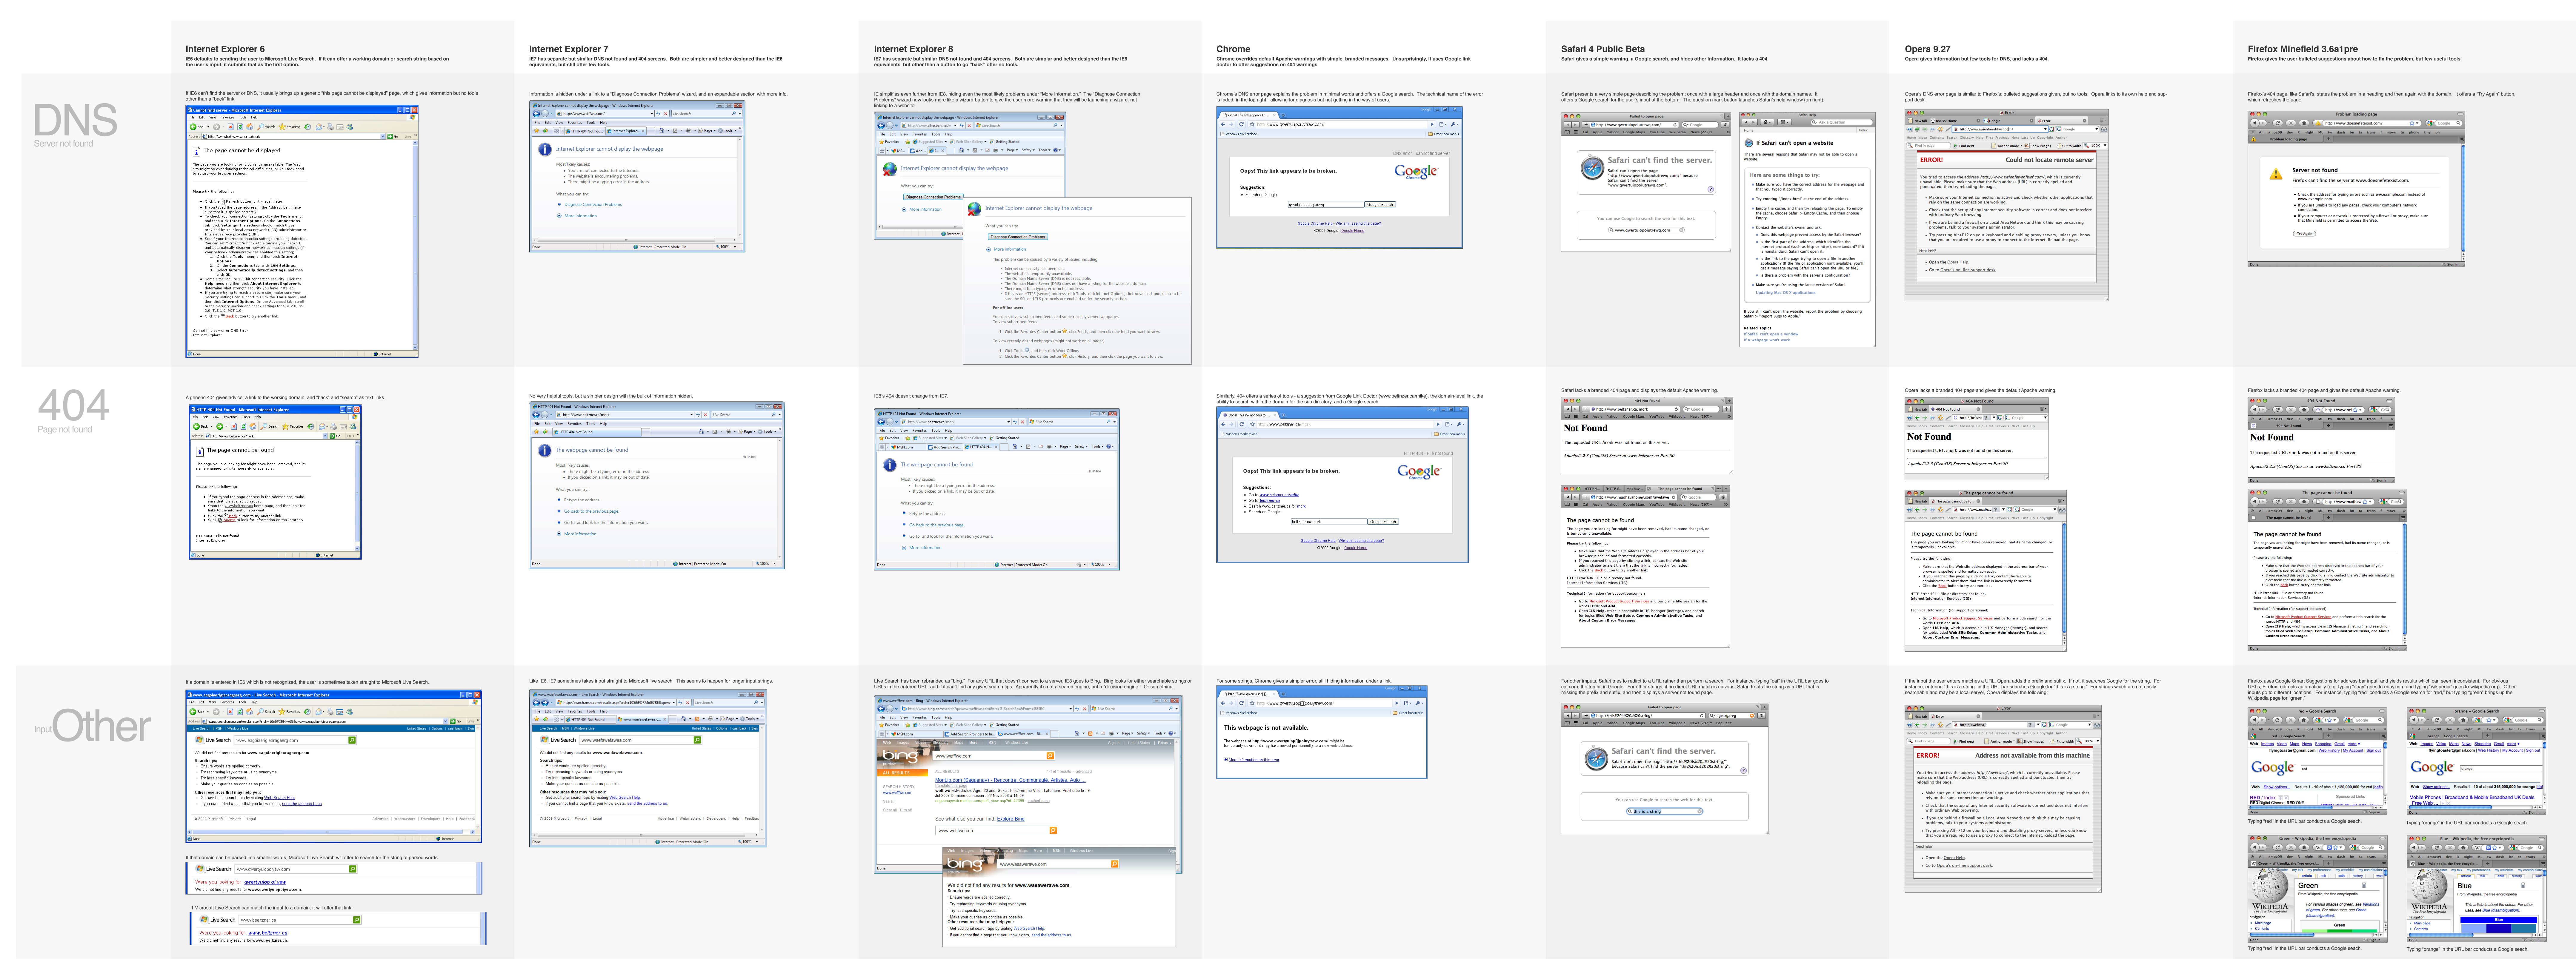 how to make default google search chrome mac not safari